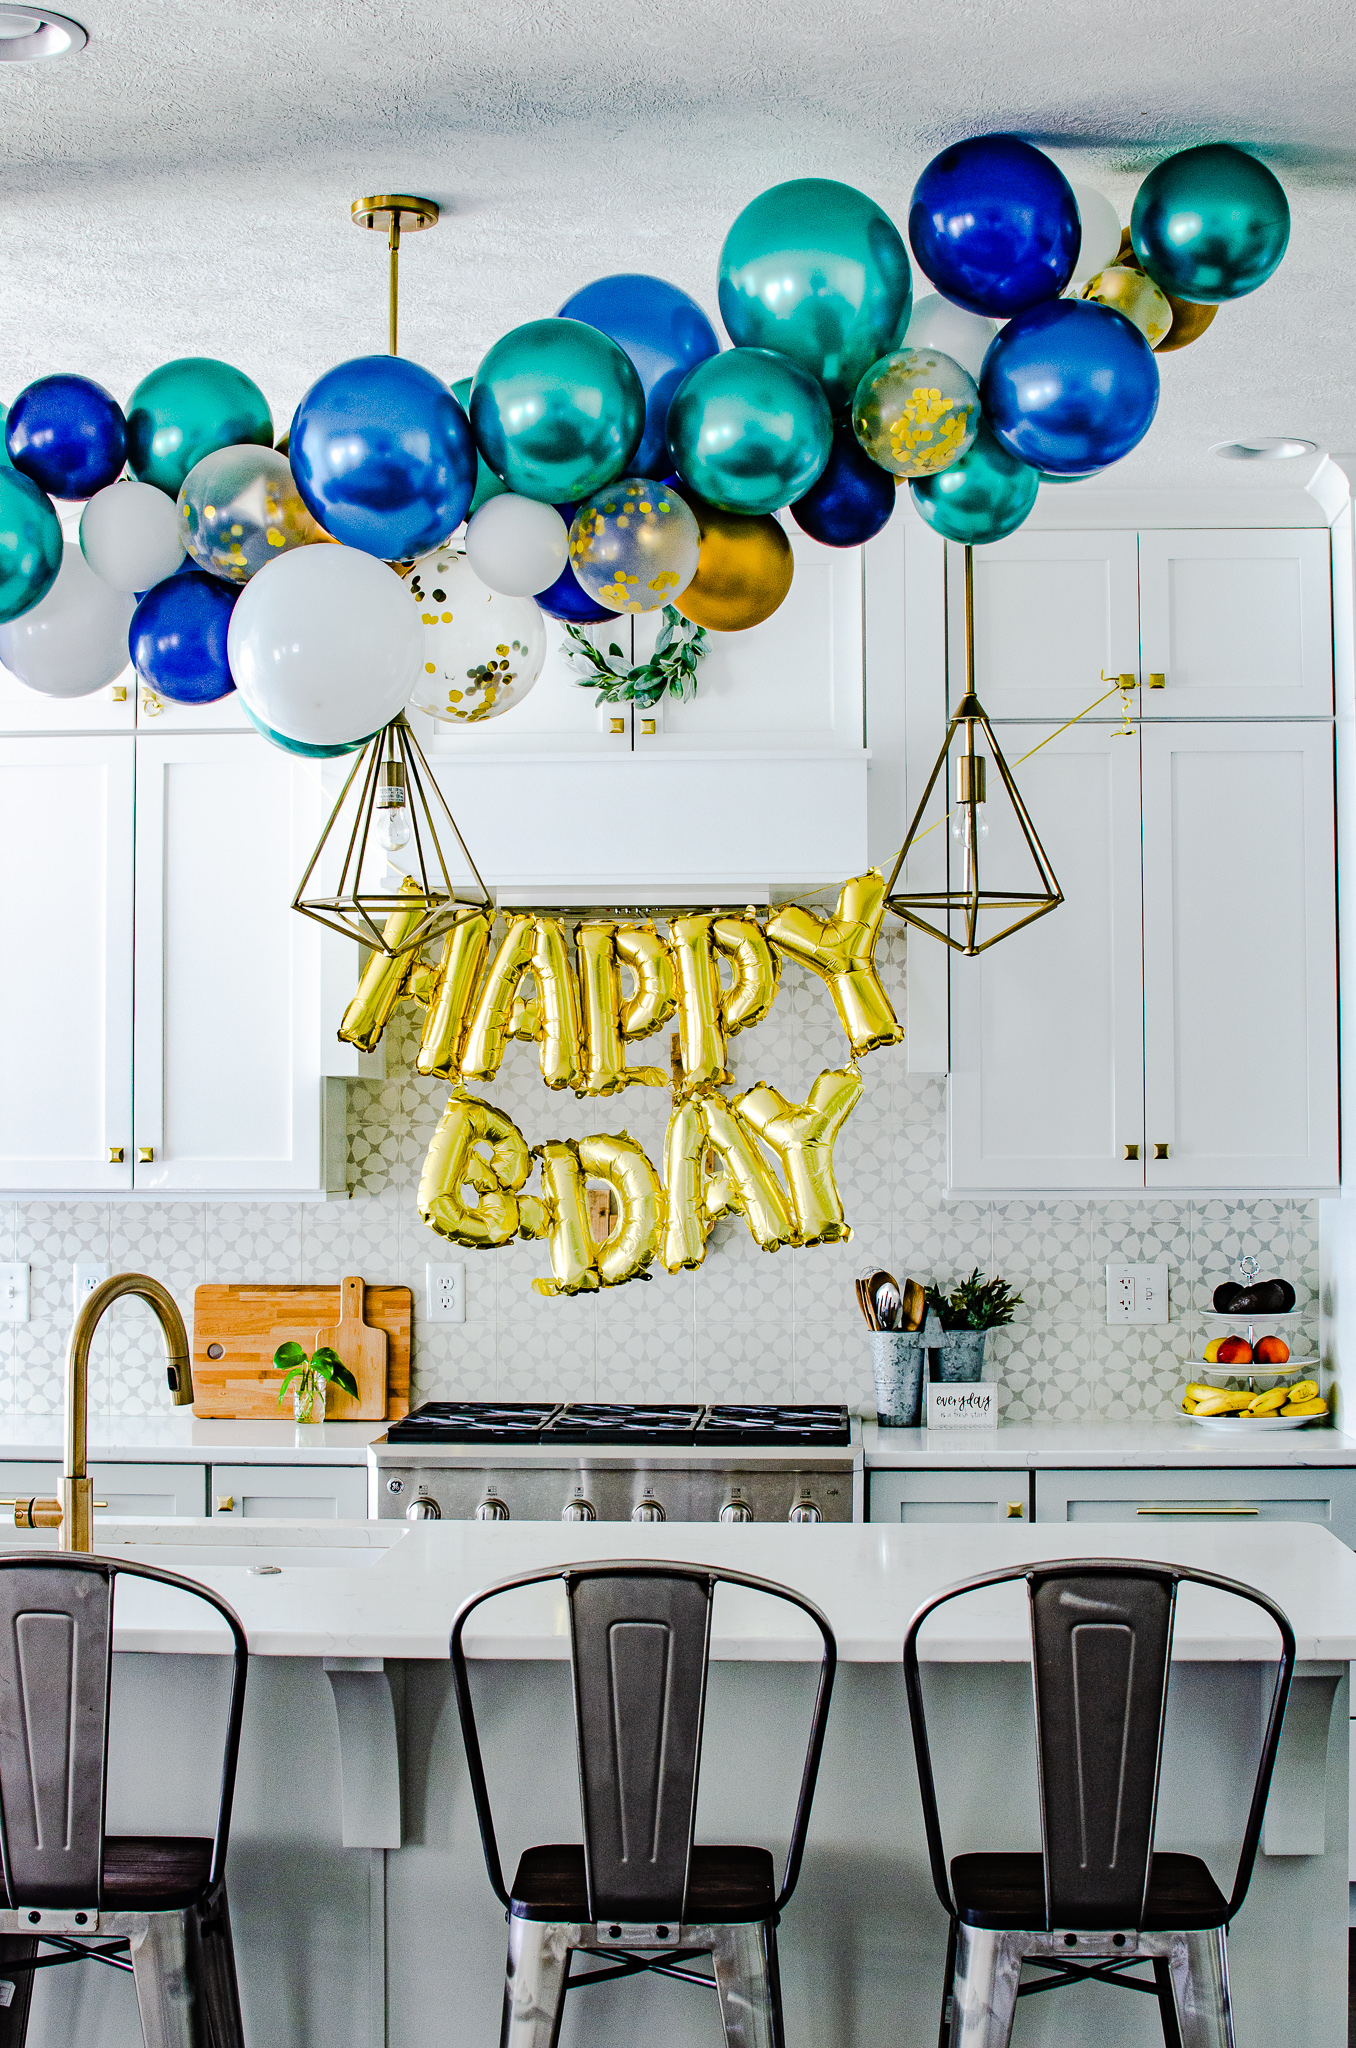 birthday balloon garland hanging from ceiling in kitchen